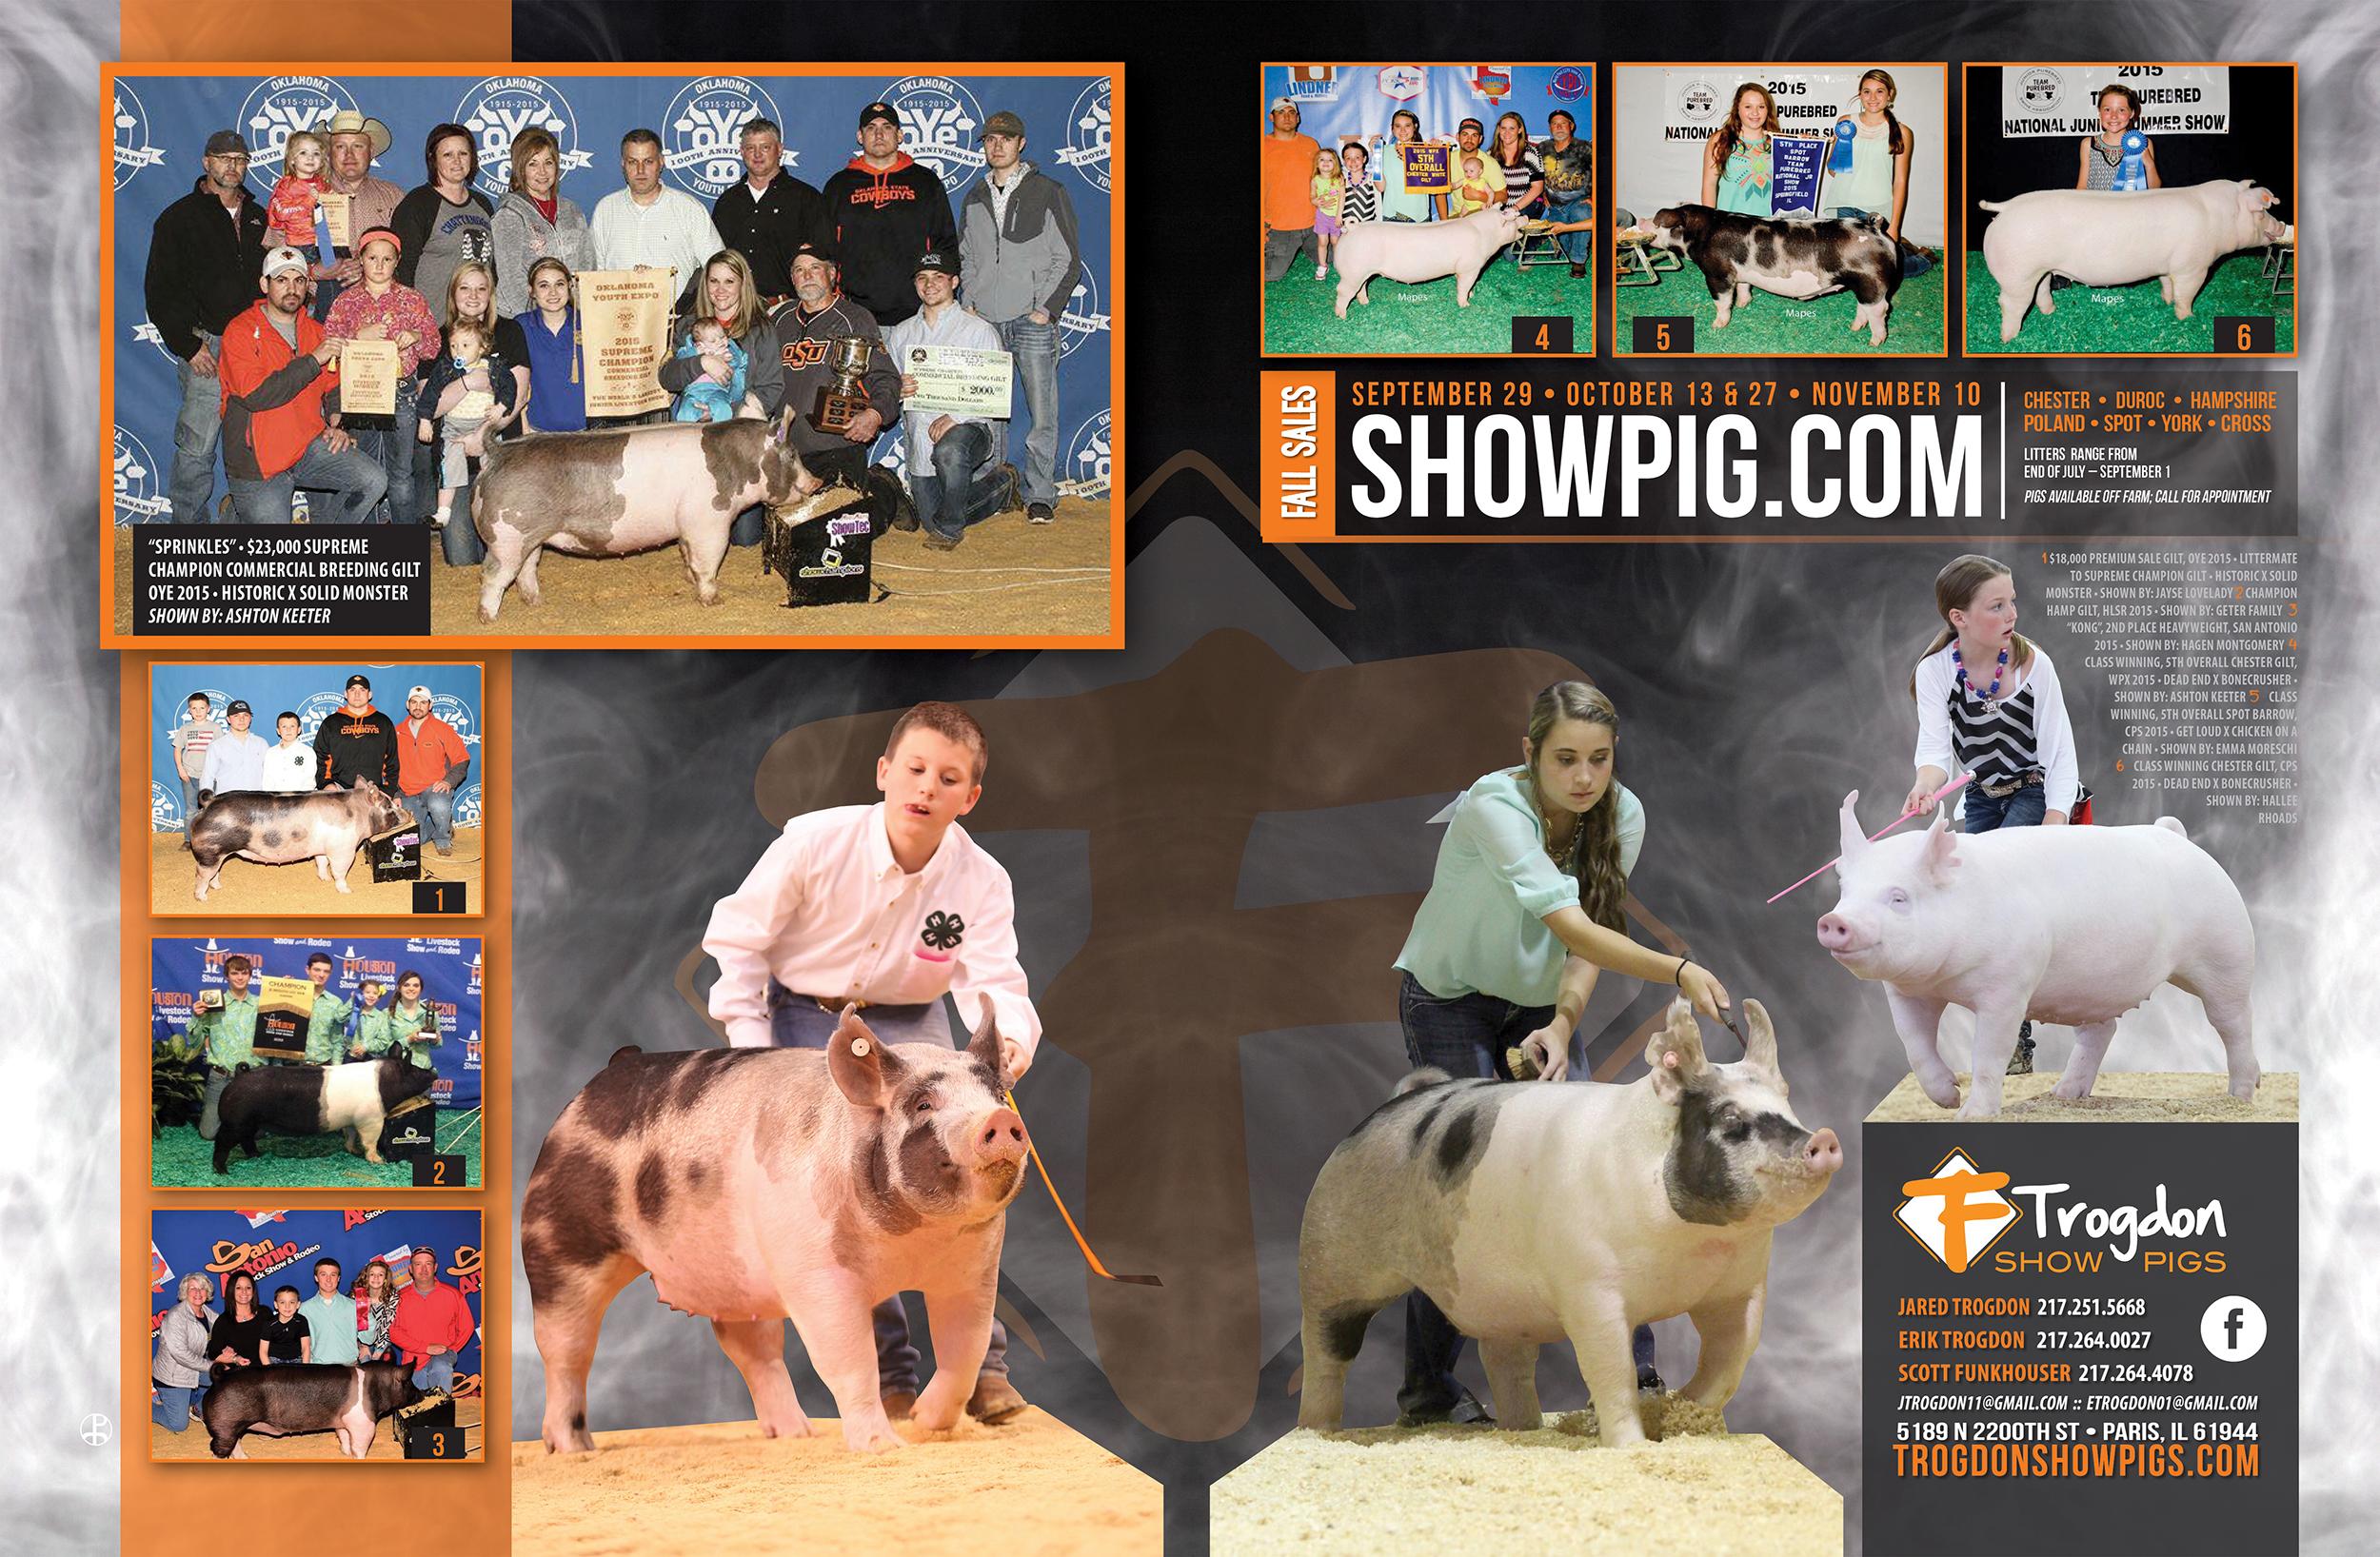 Trodgon-Show-Pigs_f15_advertisement.jpg